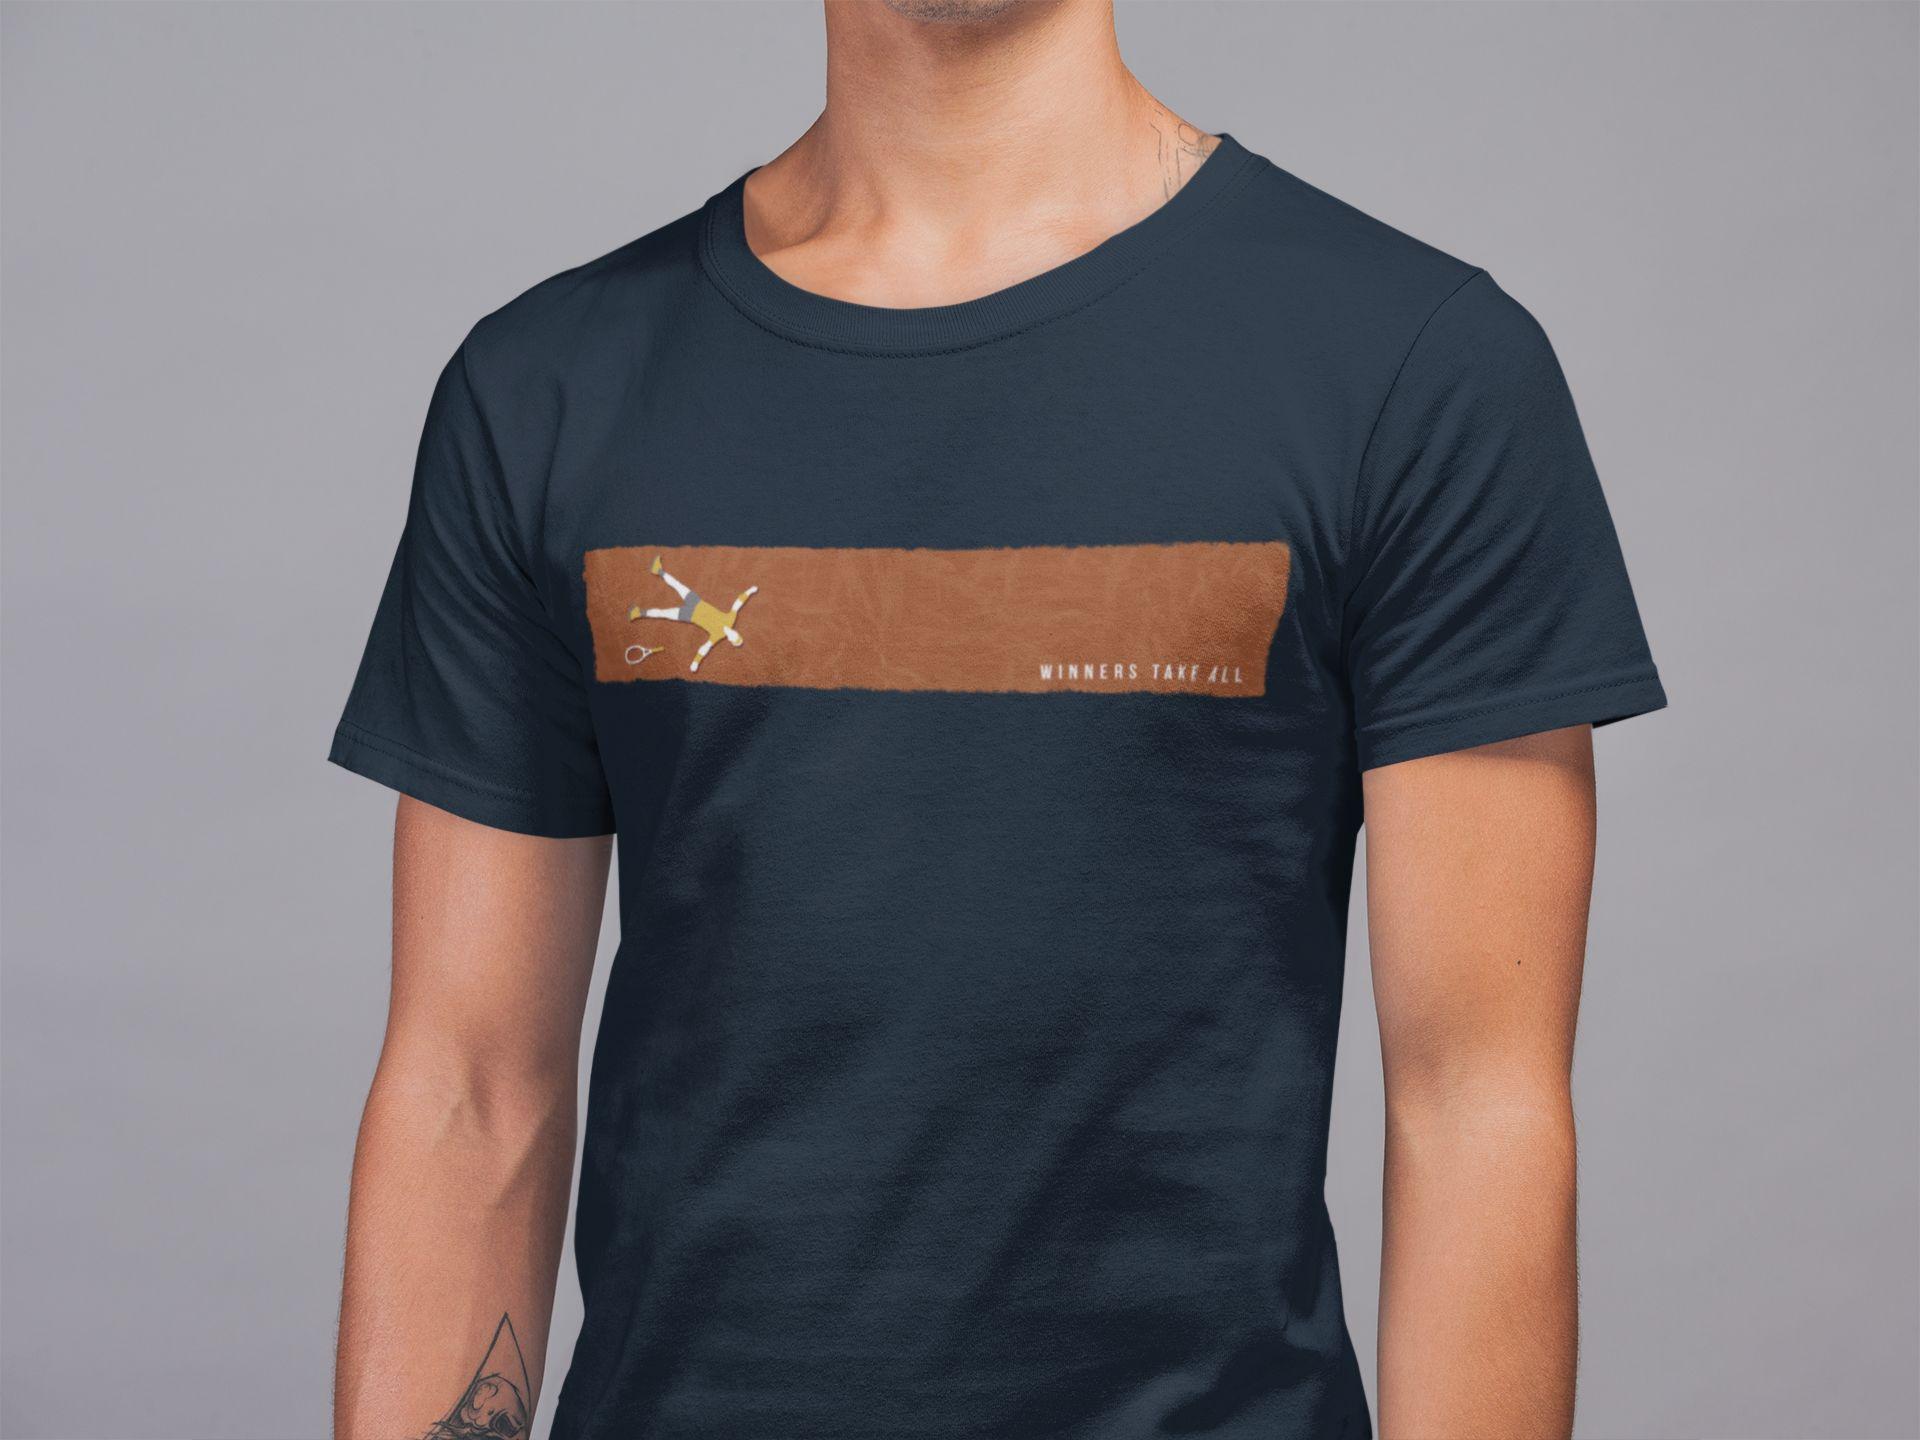 Camiseta WINNERS TAKE ALL >> Coleção 2019 >> MASCULINA